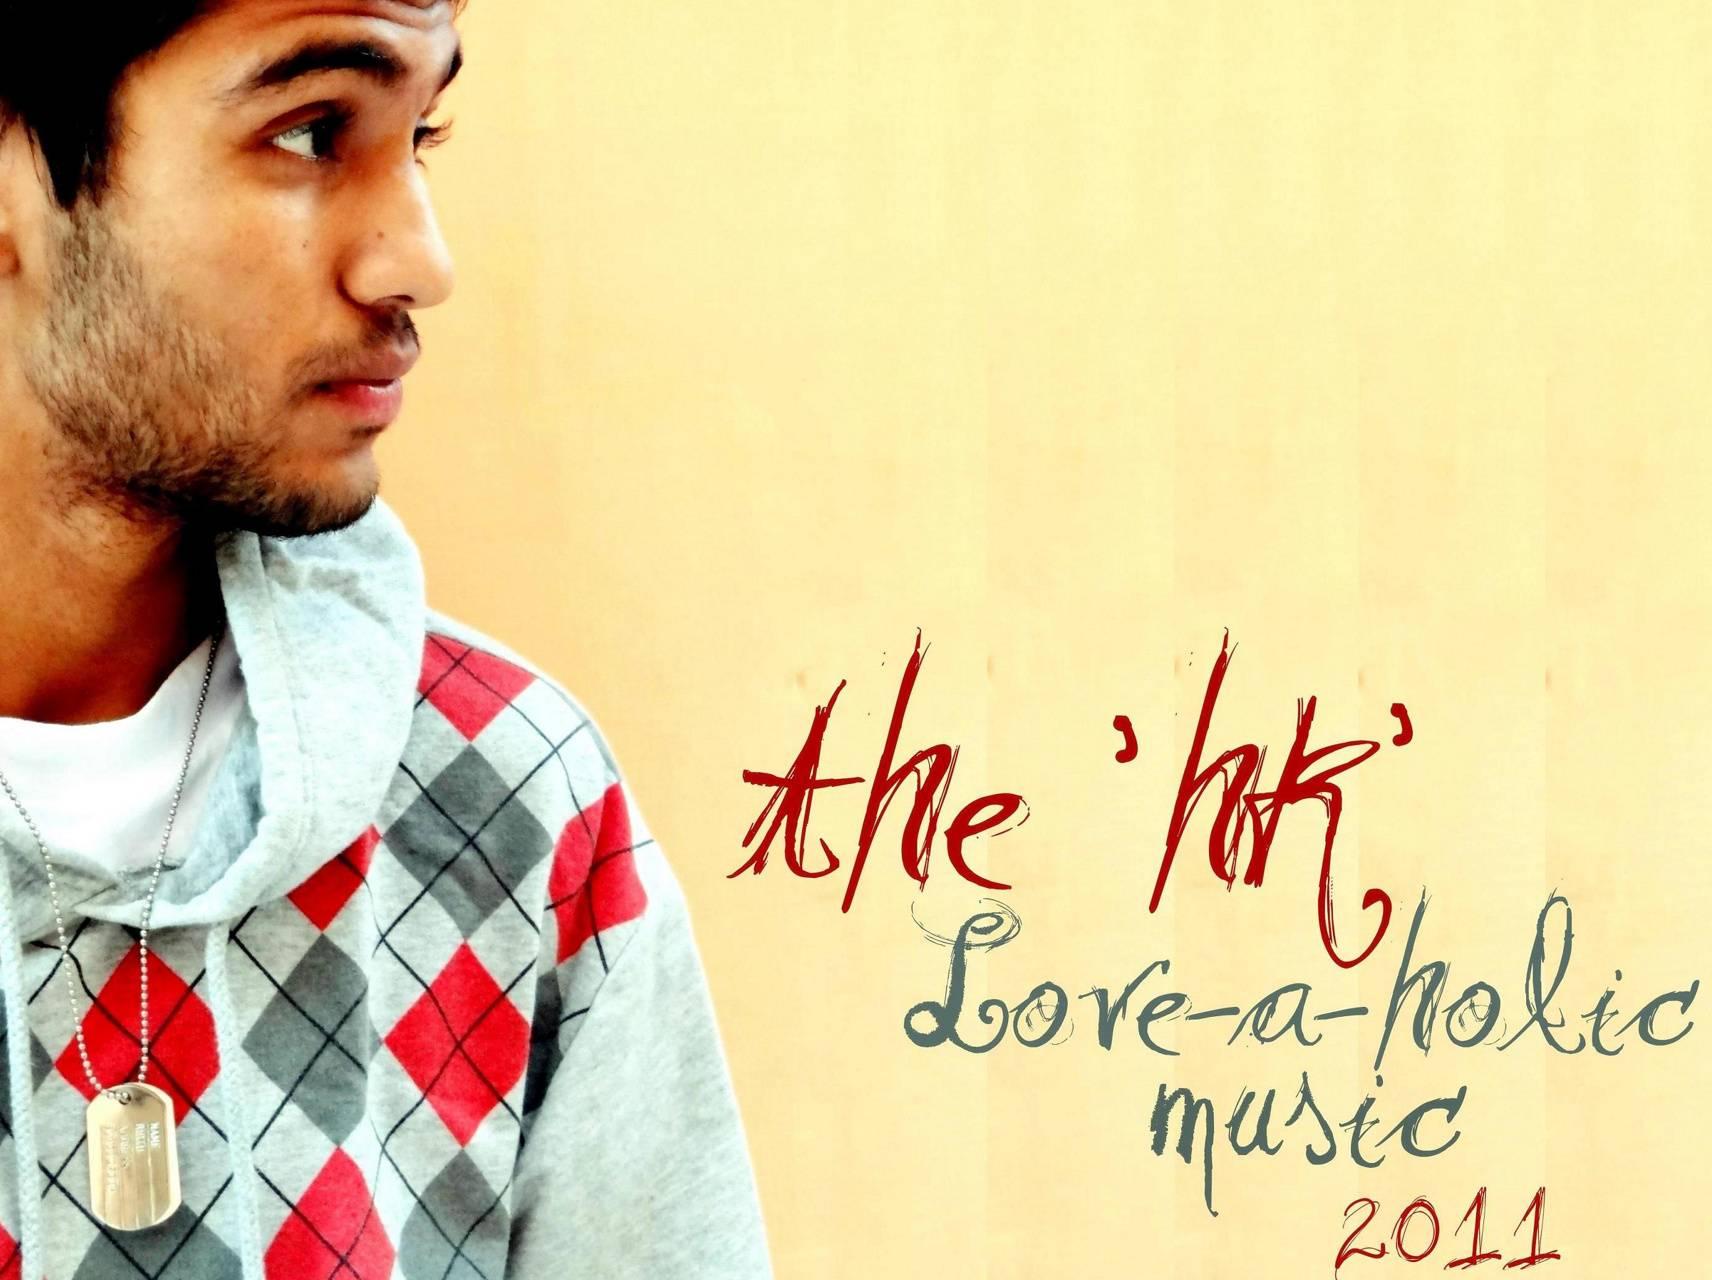 The Hk Love-a-holic